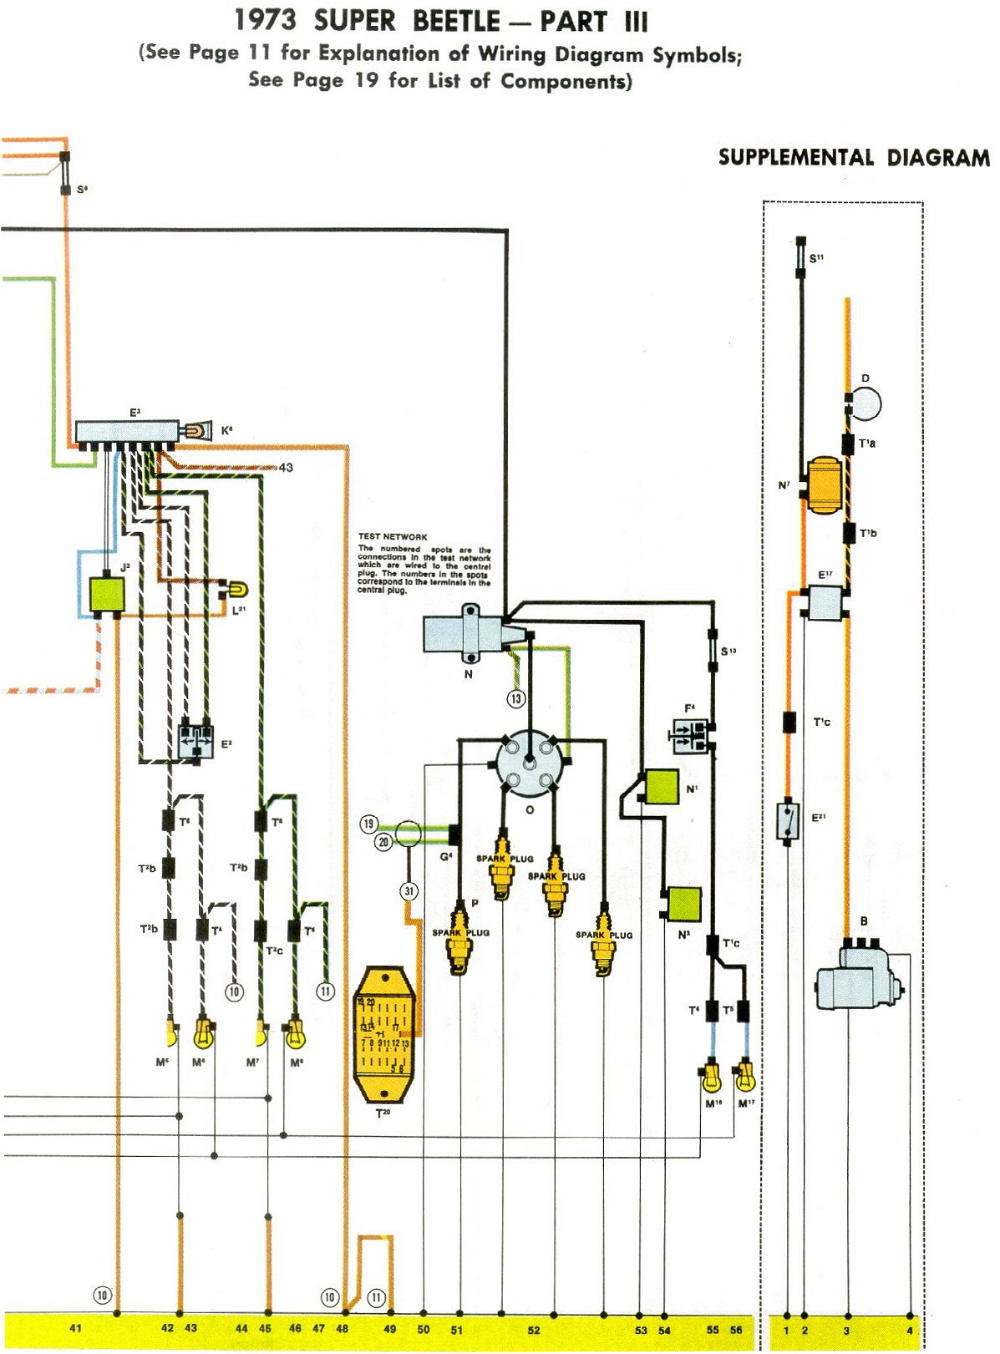 1973 Super Beetle Wiring Diagram | TheGoldenBug.com | Vw ...